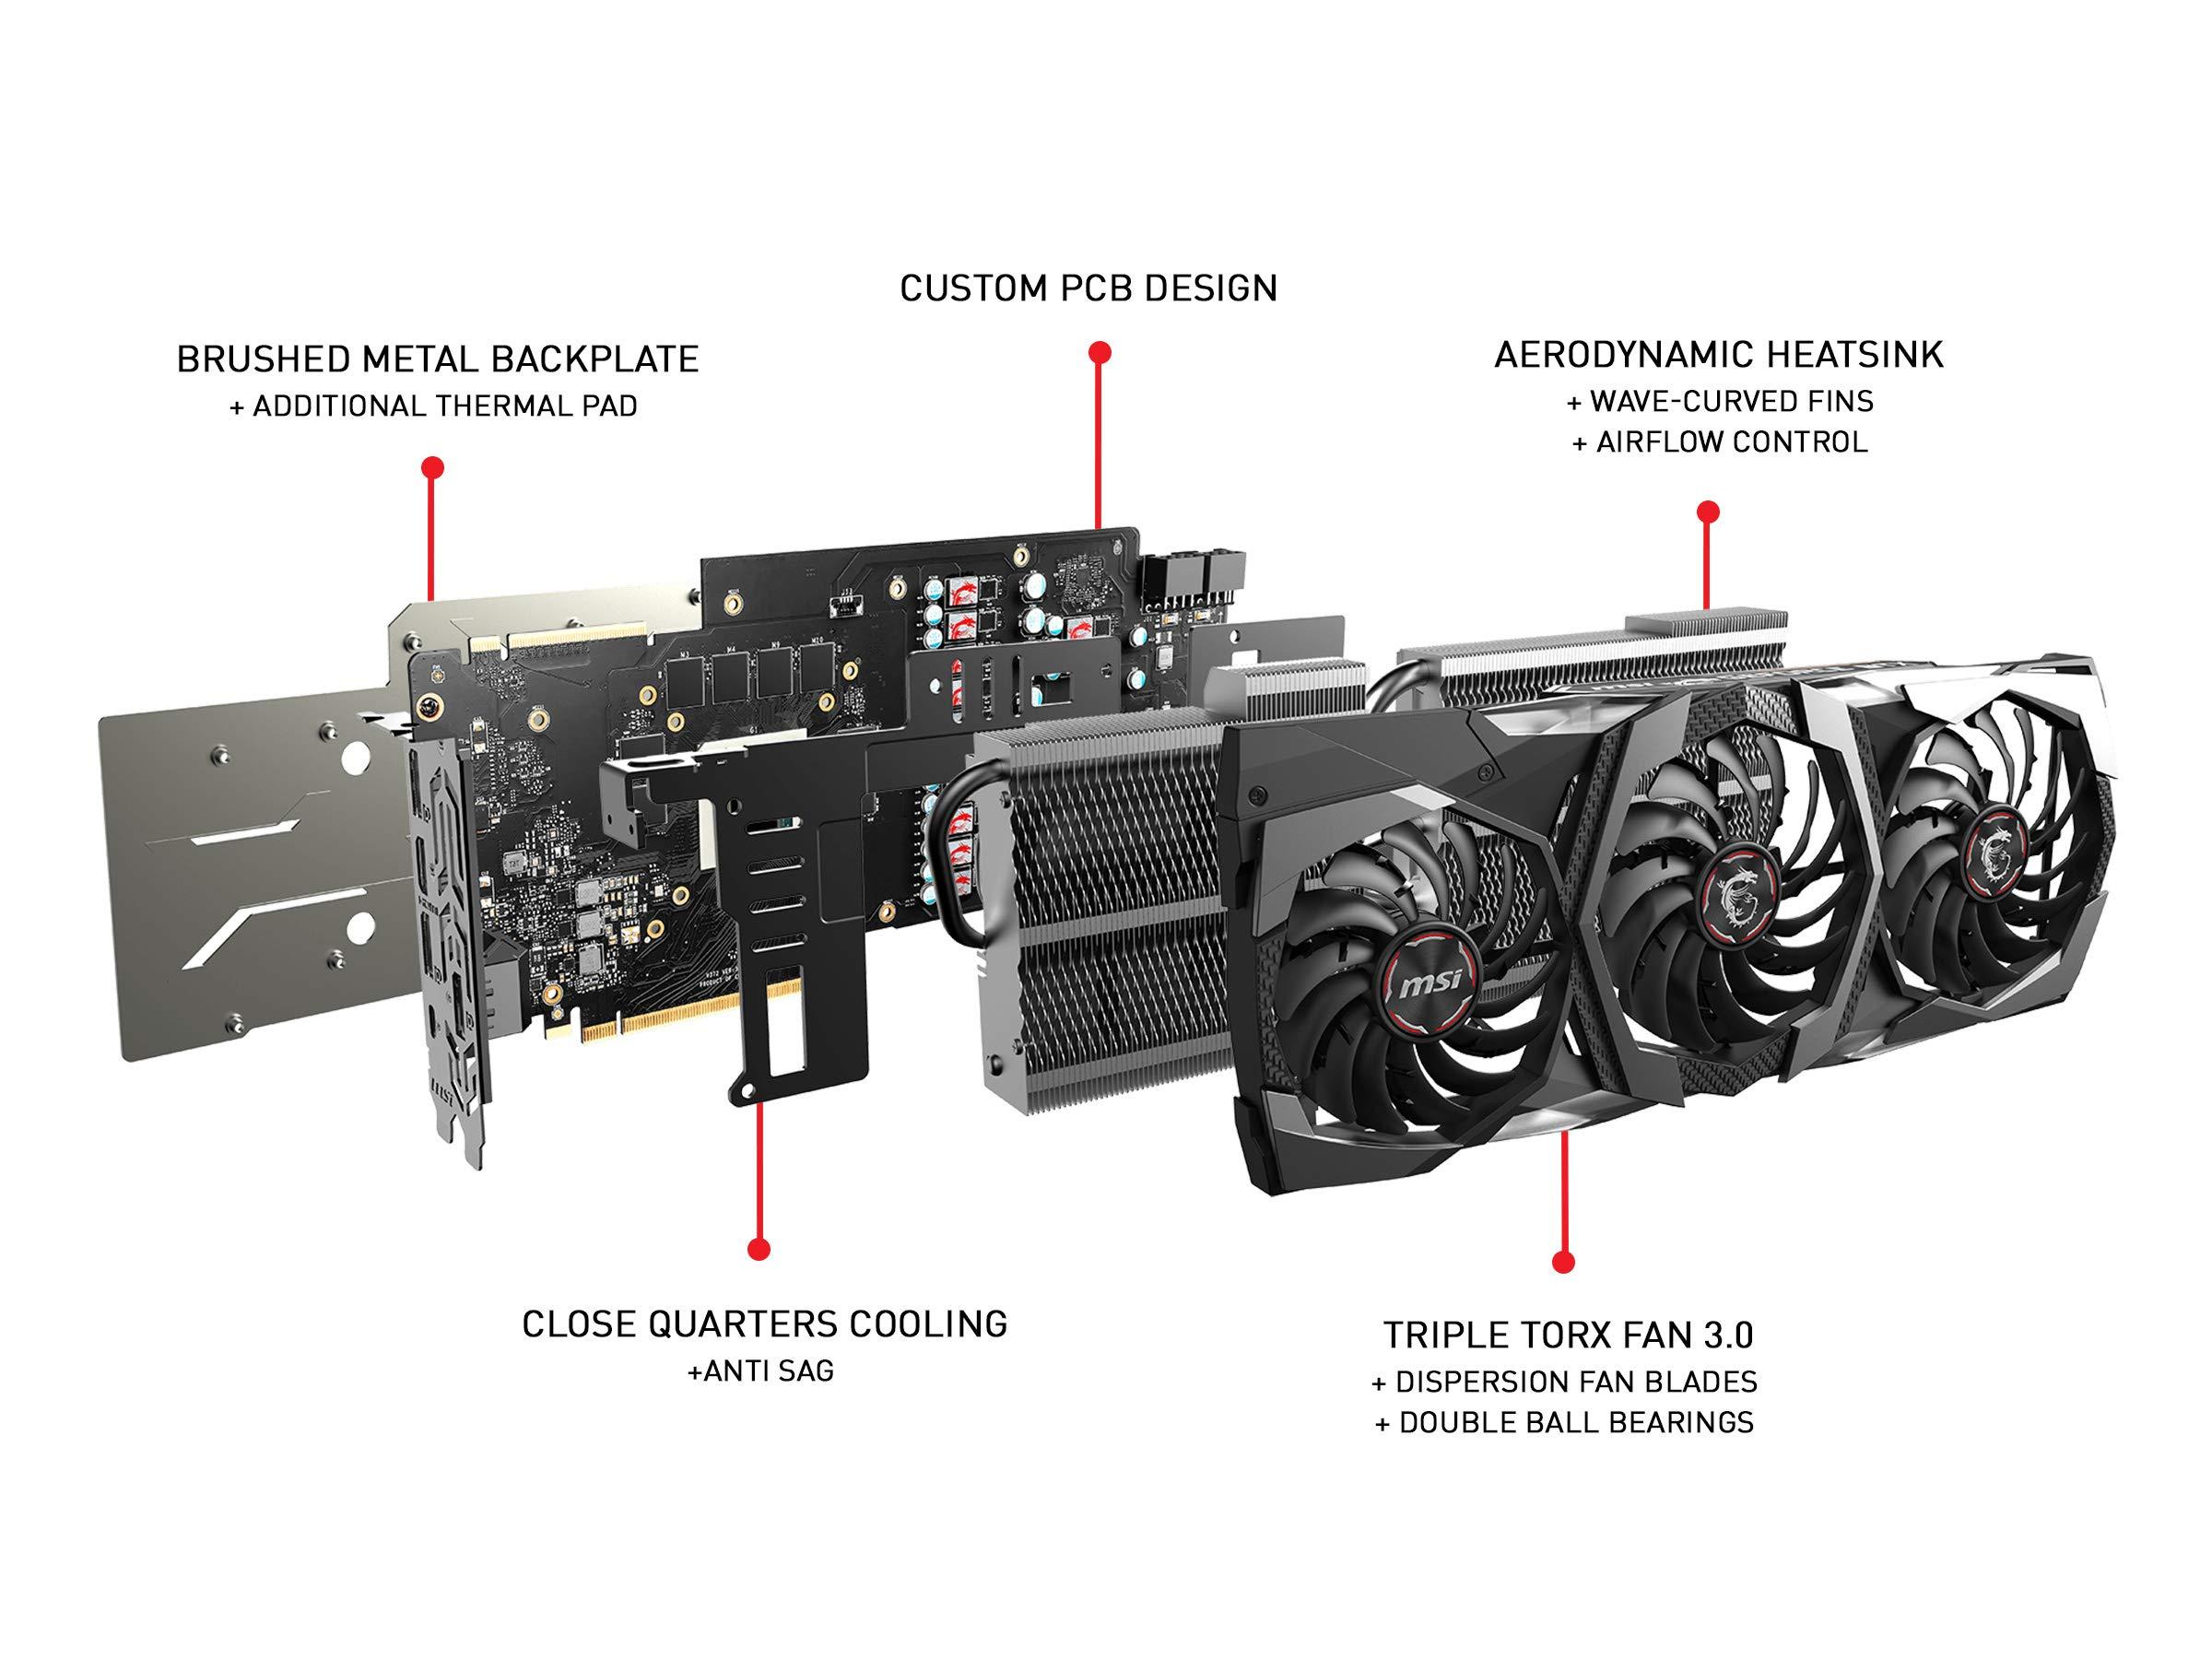 MSI Gaming GeForce RTX 2080 8GB GDRR6 256-bit VR Ready Graphics Card (RTX 2080 GAMING X TRIO) by MSI (Image #6)